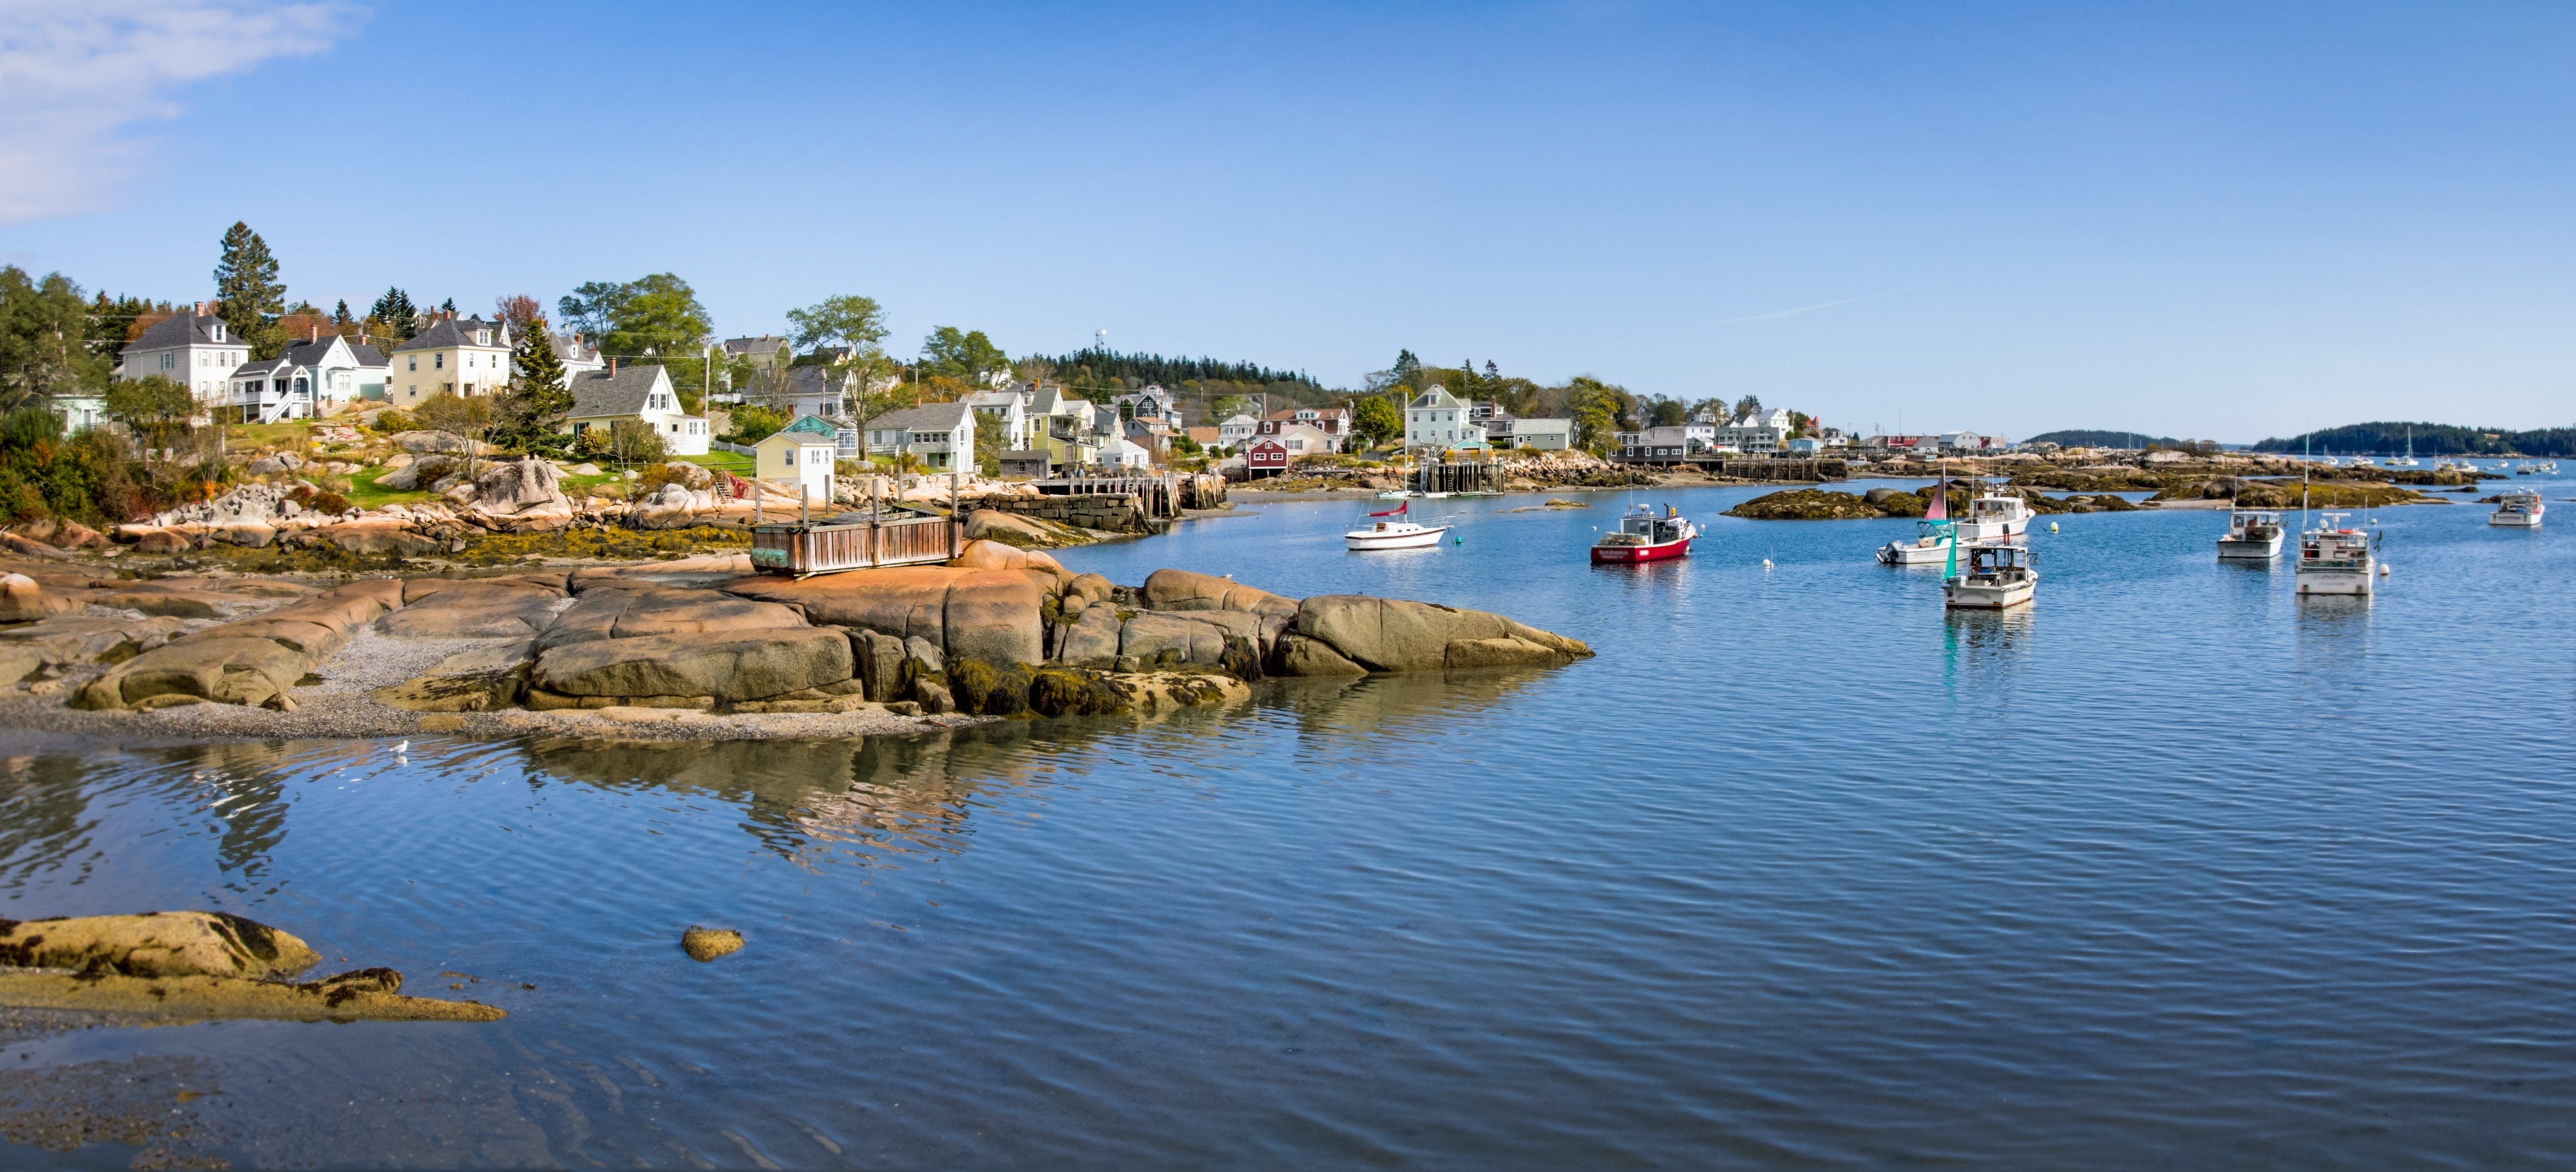 Camden, Maine, United States of America